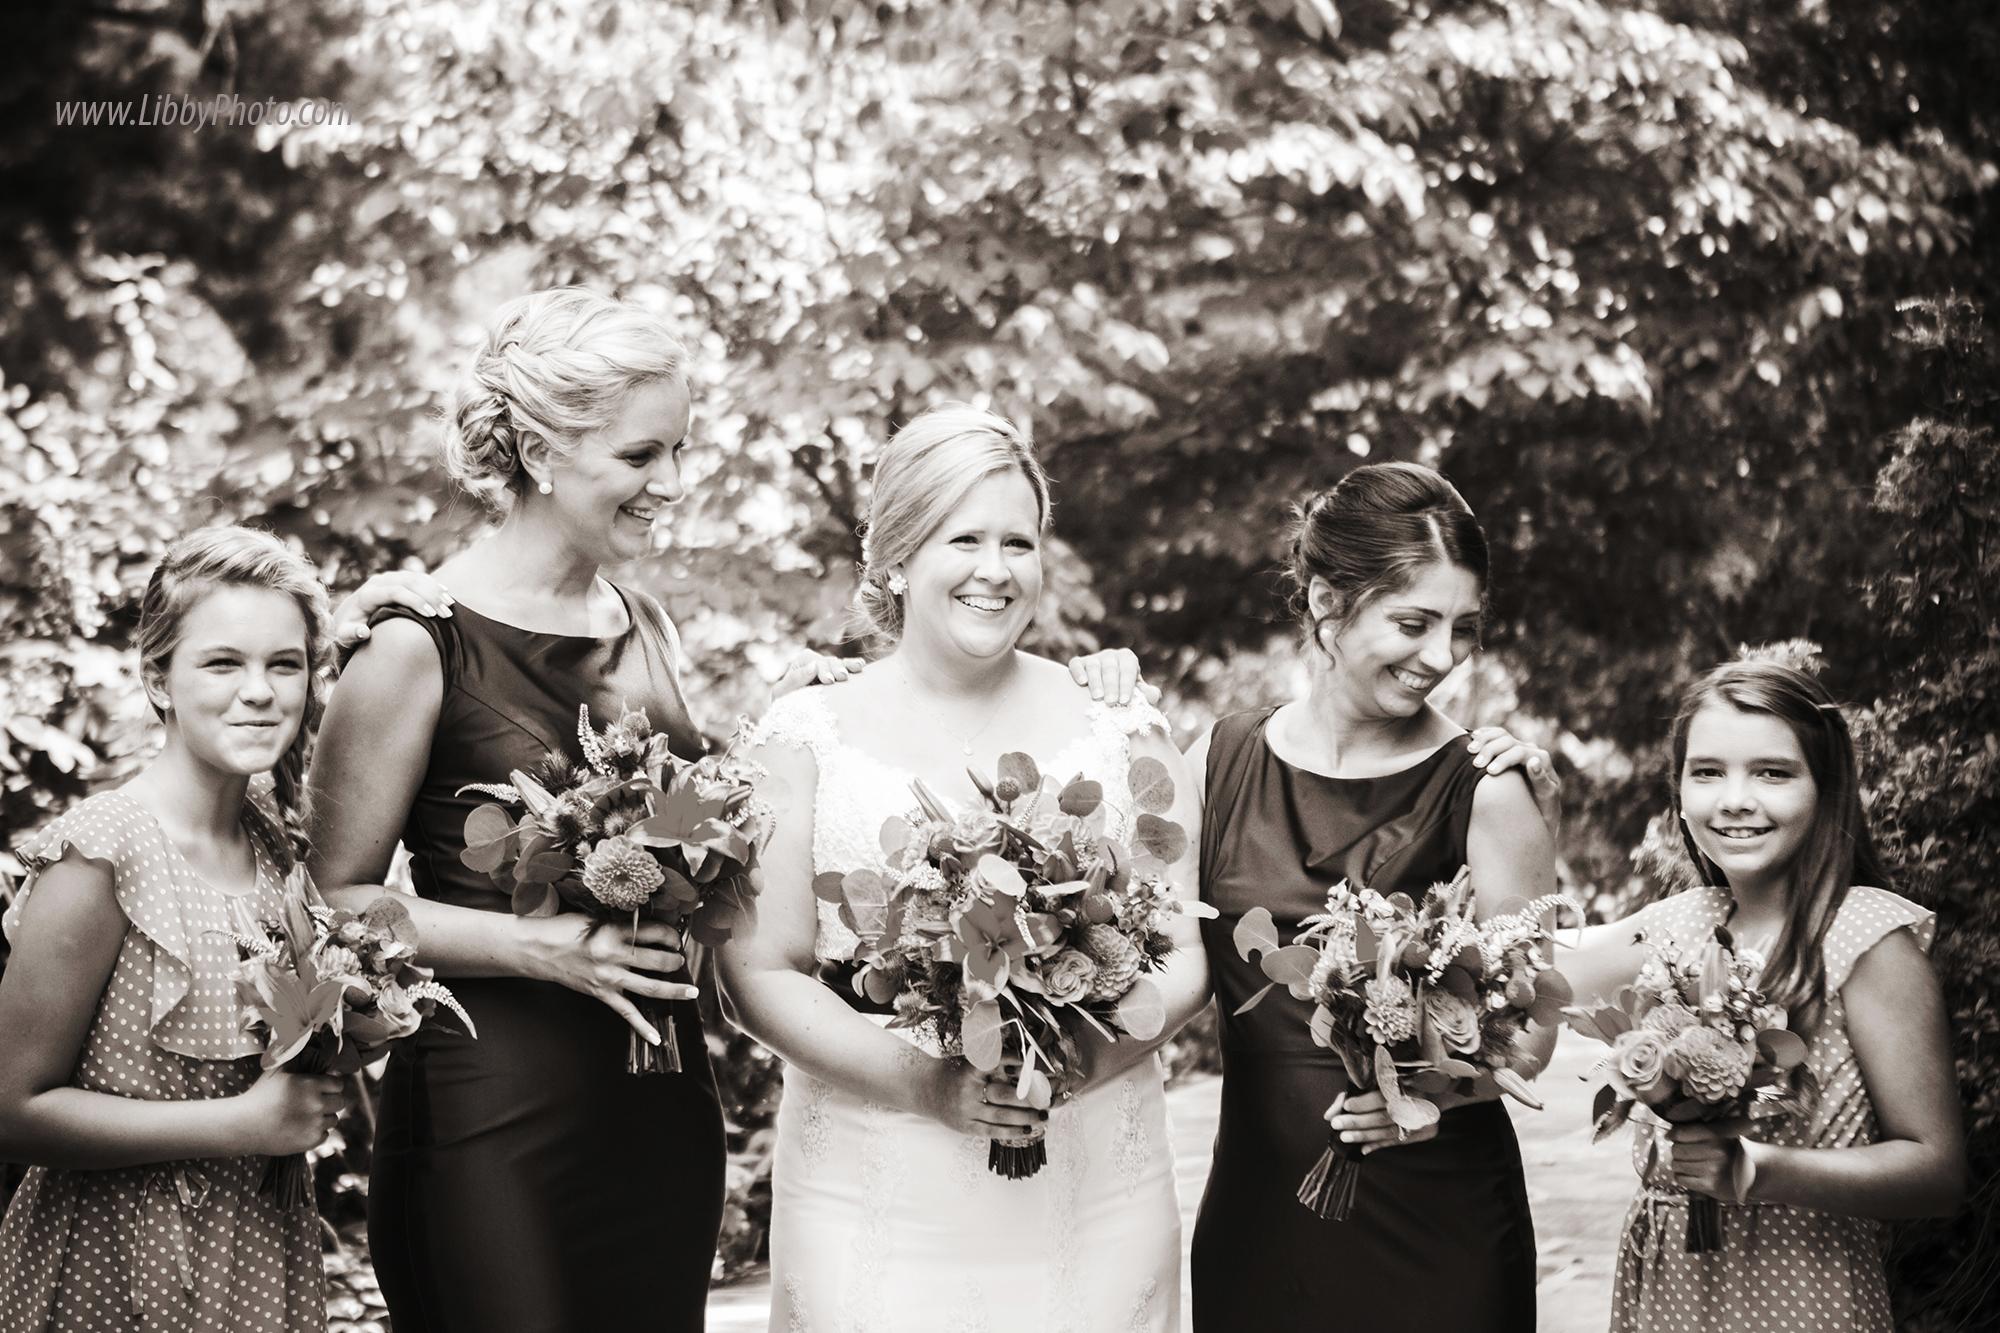 Atlanta wedding photography, Libbyphoto11 (2).jpg